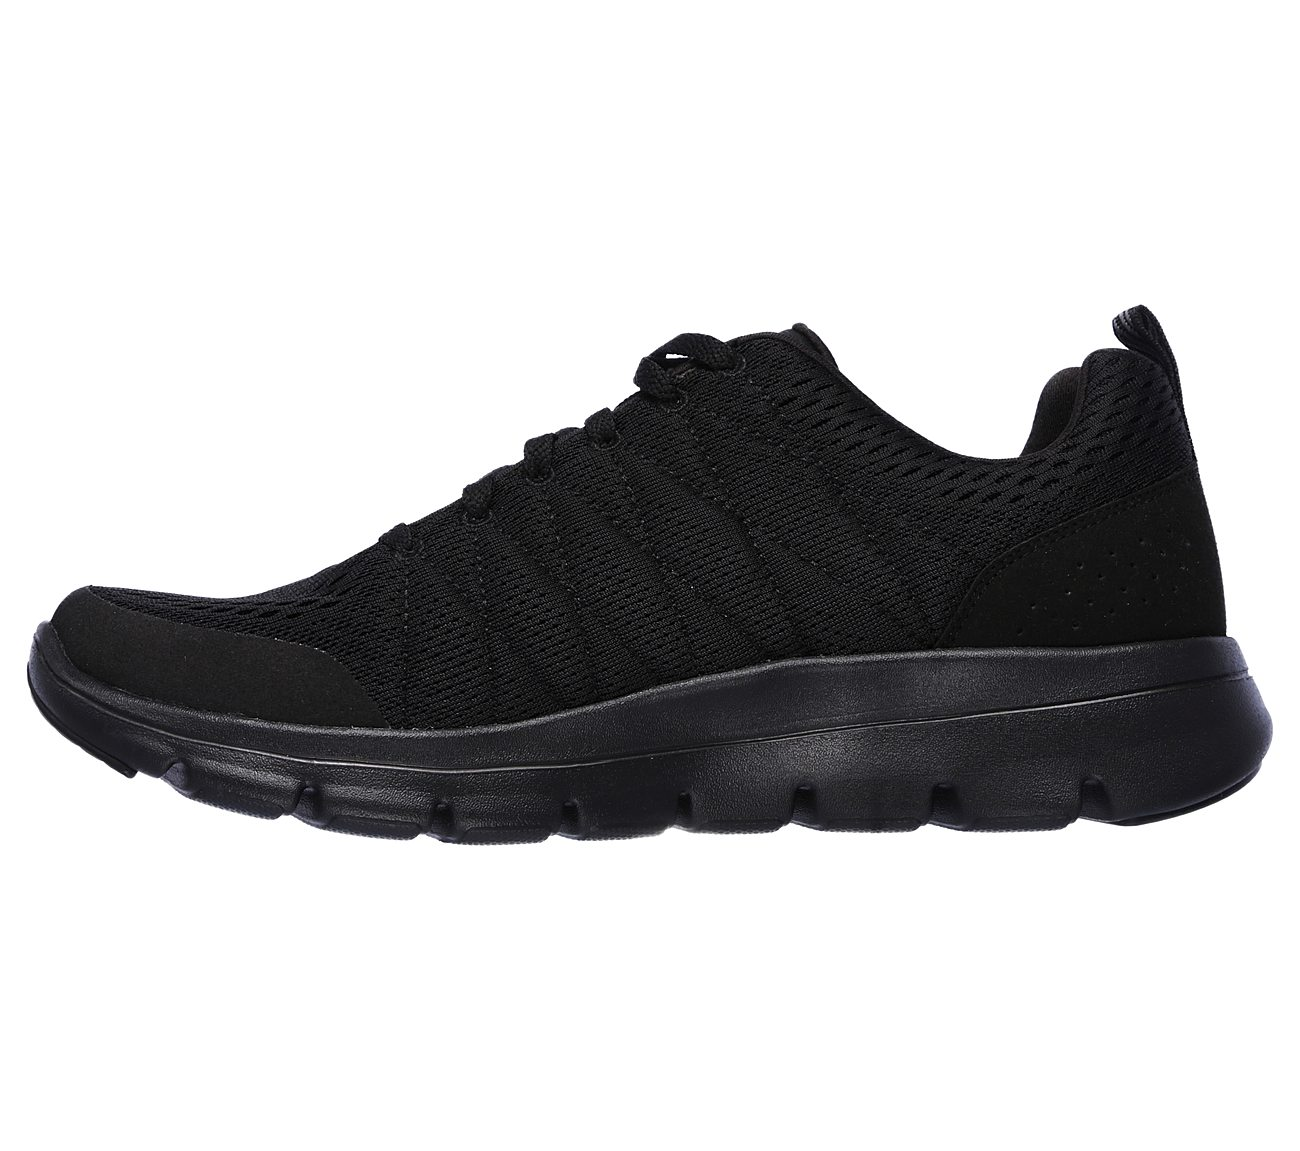 cf9da960adb2e Buy SKECHERS Marauder - Mershon SKECHERS Sport Shoes only £64.00